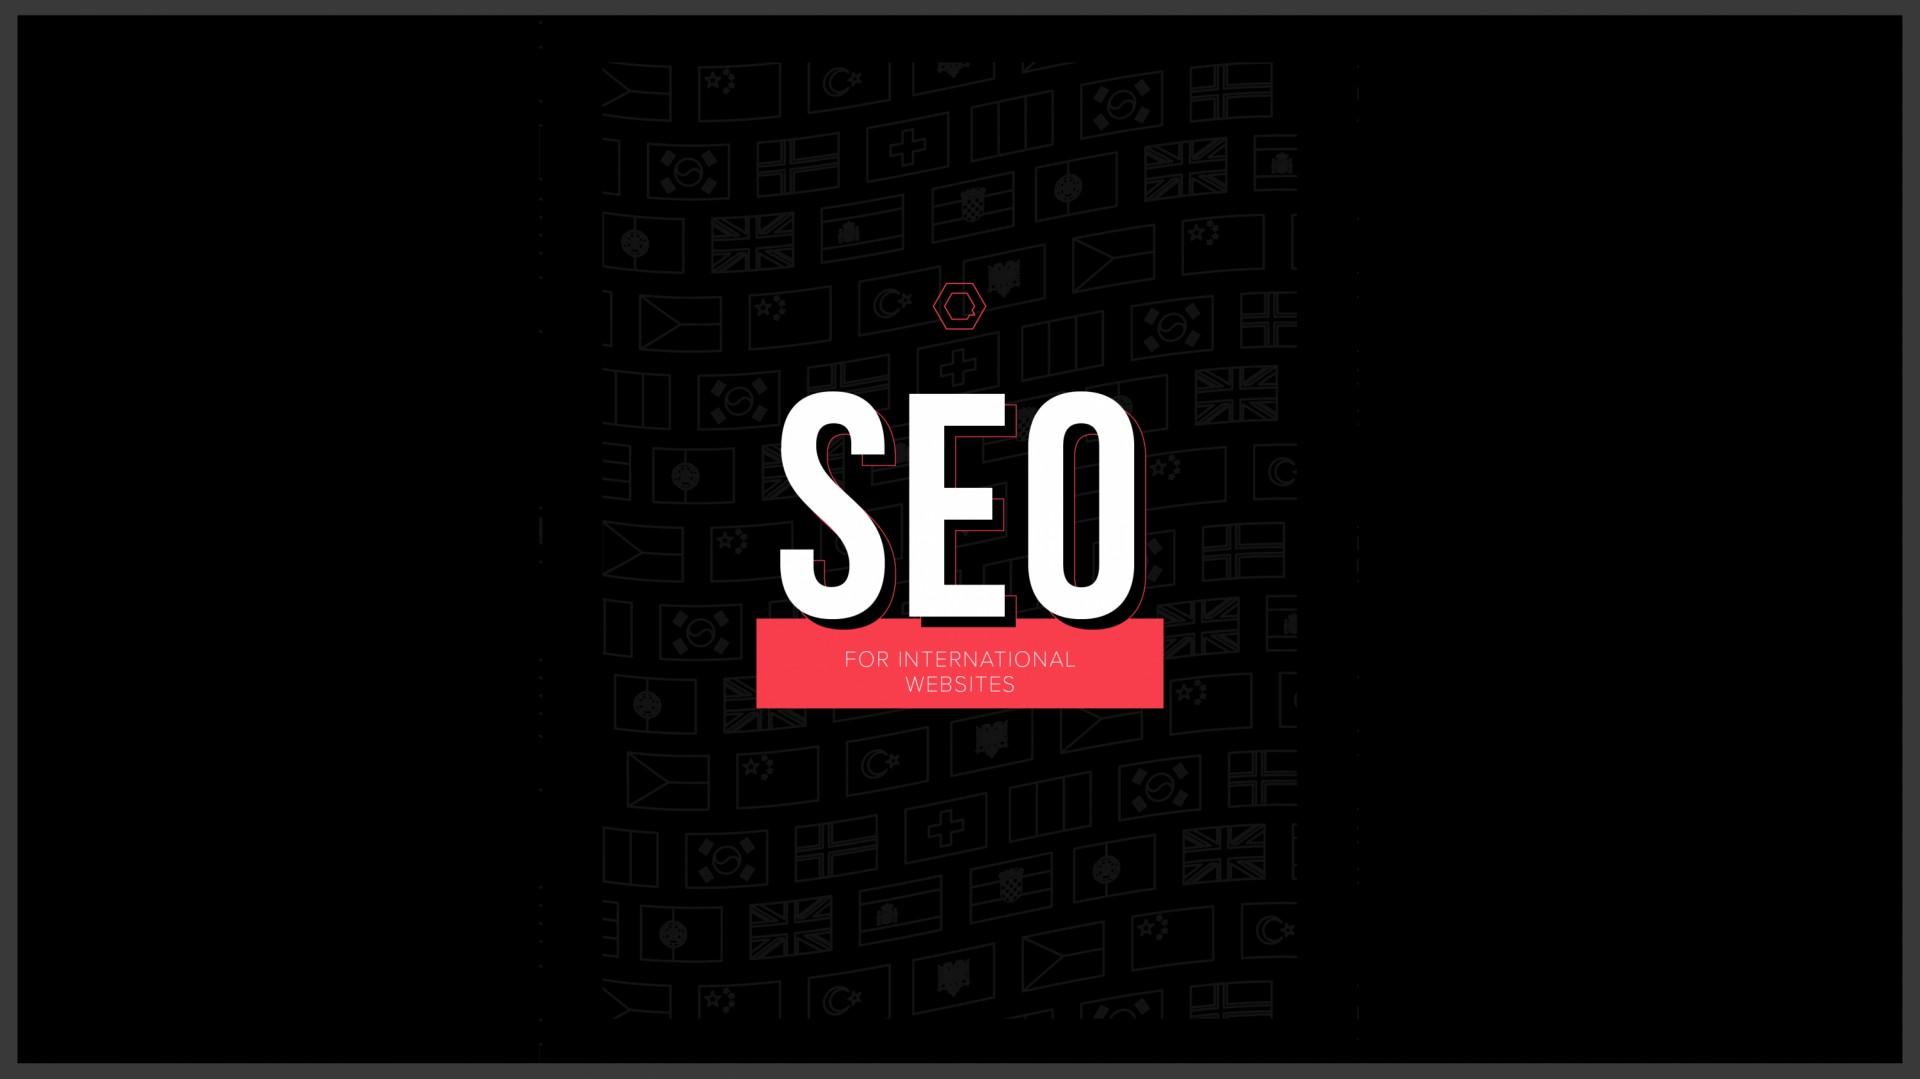 SEO for international websites